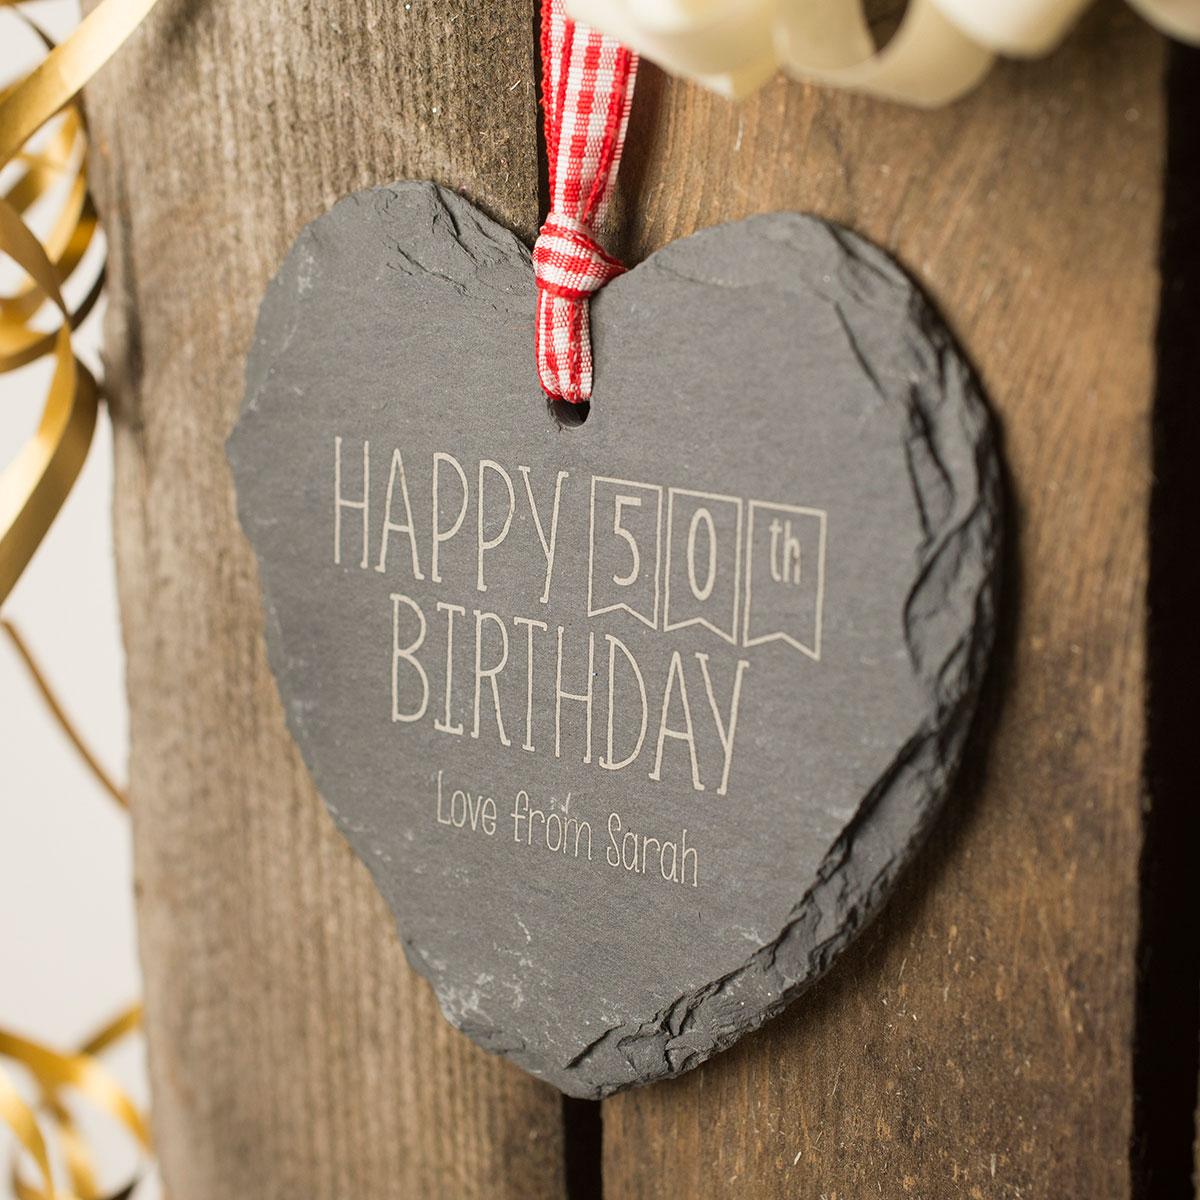 Image of Engraved Heart Shaped Slate Hanging Keepsake - Happy 50th Birthday